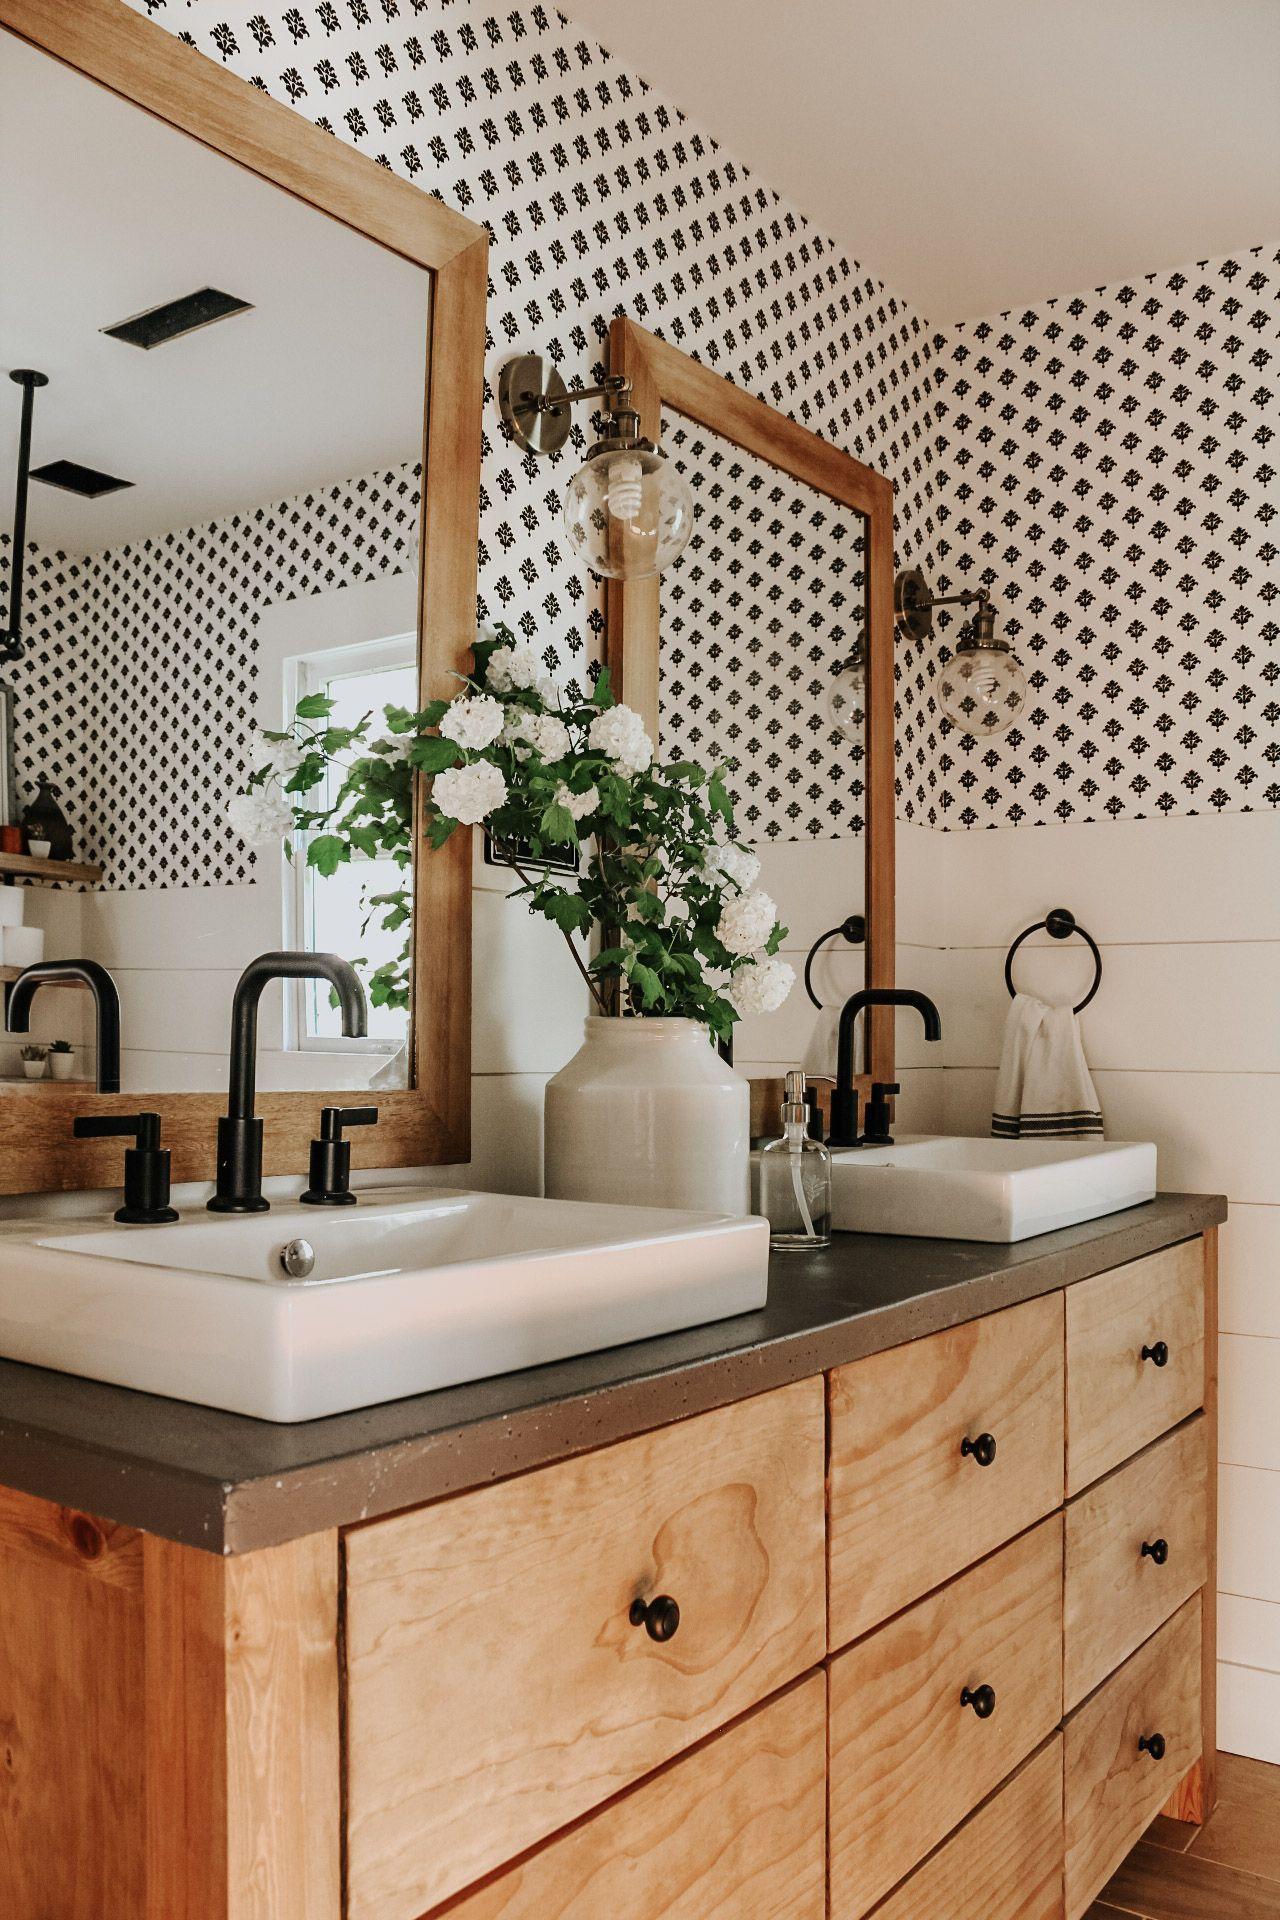 Photo of Flimsy Furniture Living Room Kitchen Cabinets #hometown #LargeLivingRoomFurnitur…